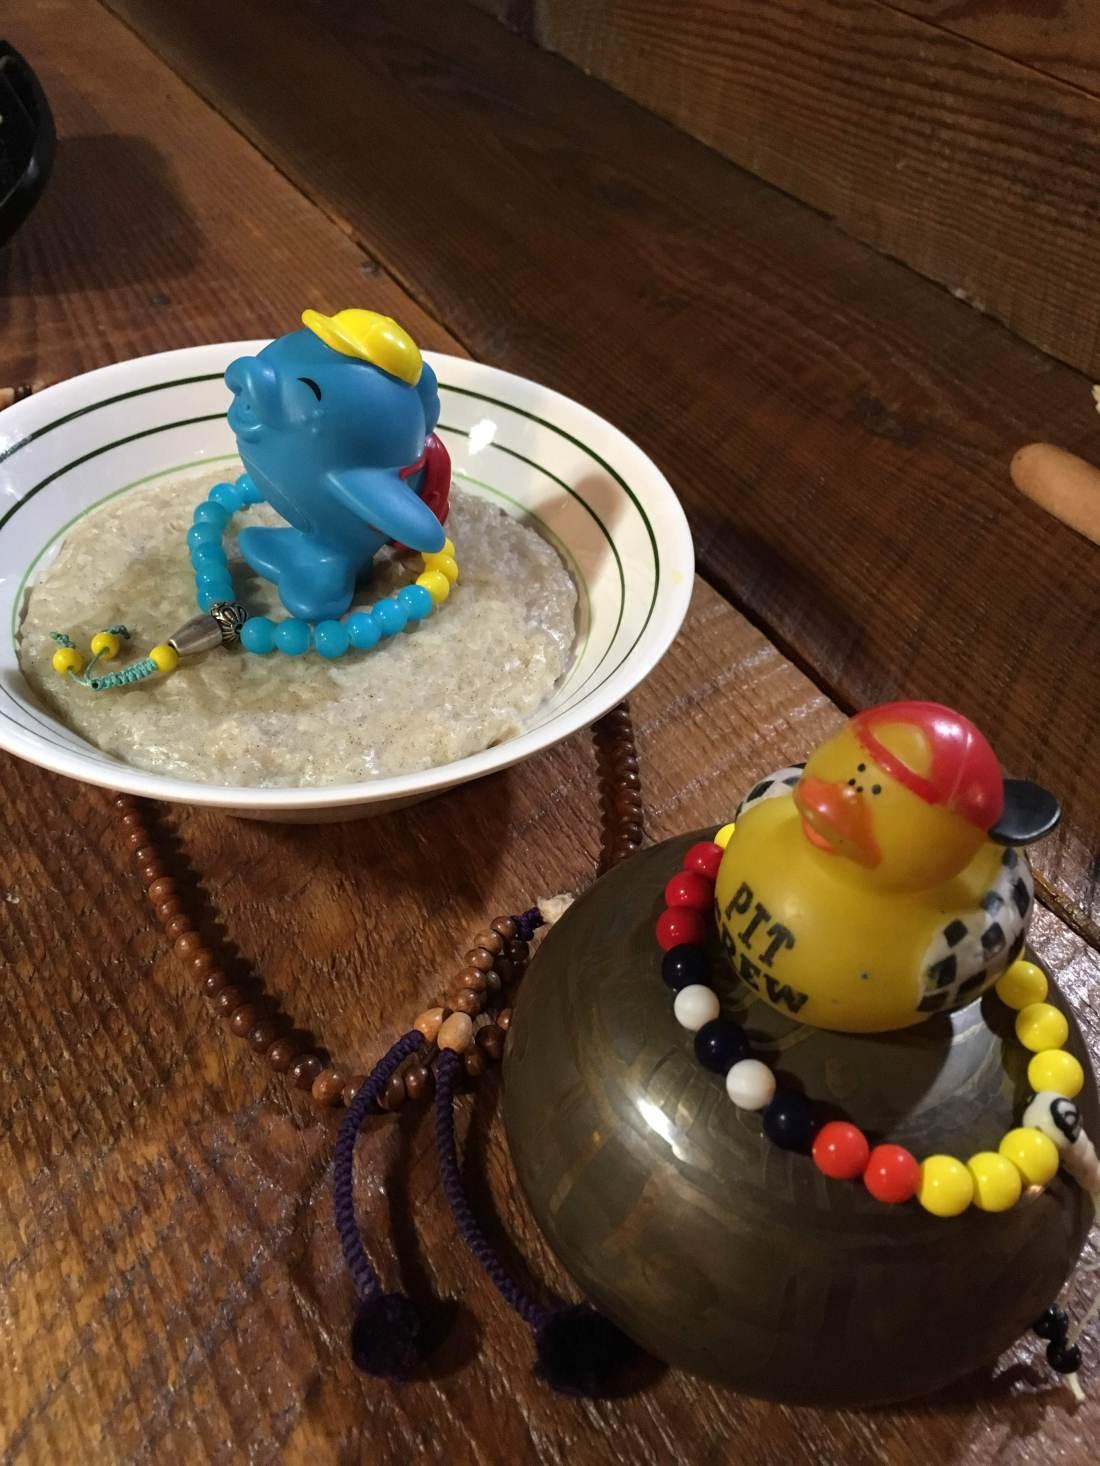 bodhi_day_rice_and_milk